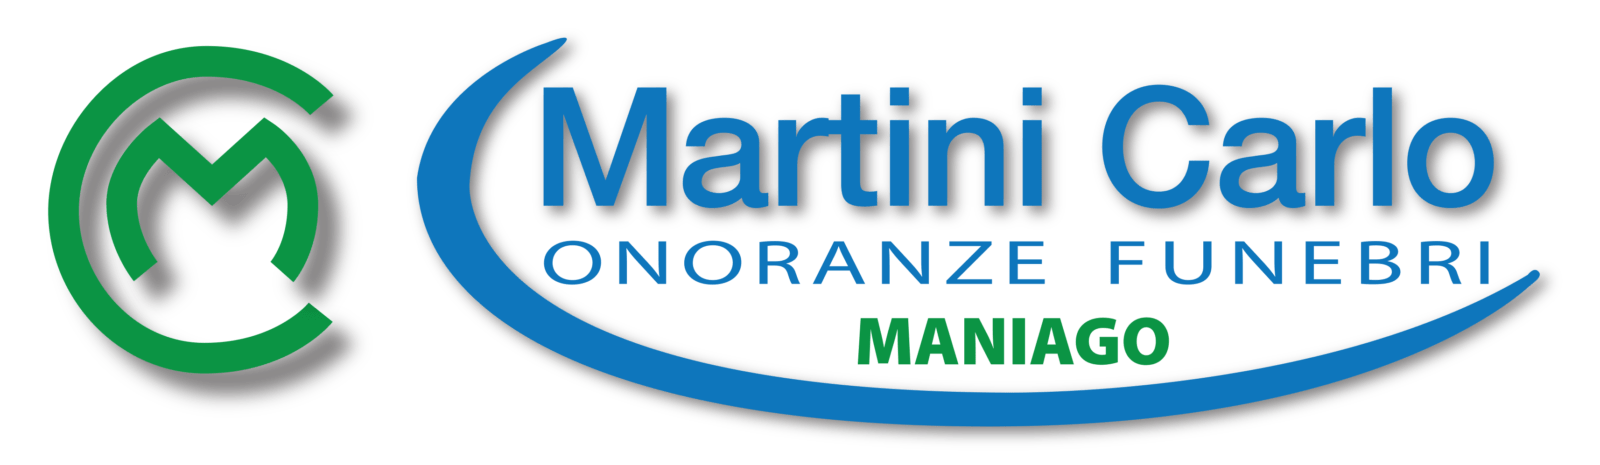 Martini Carlo